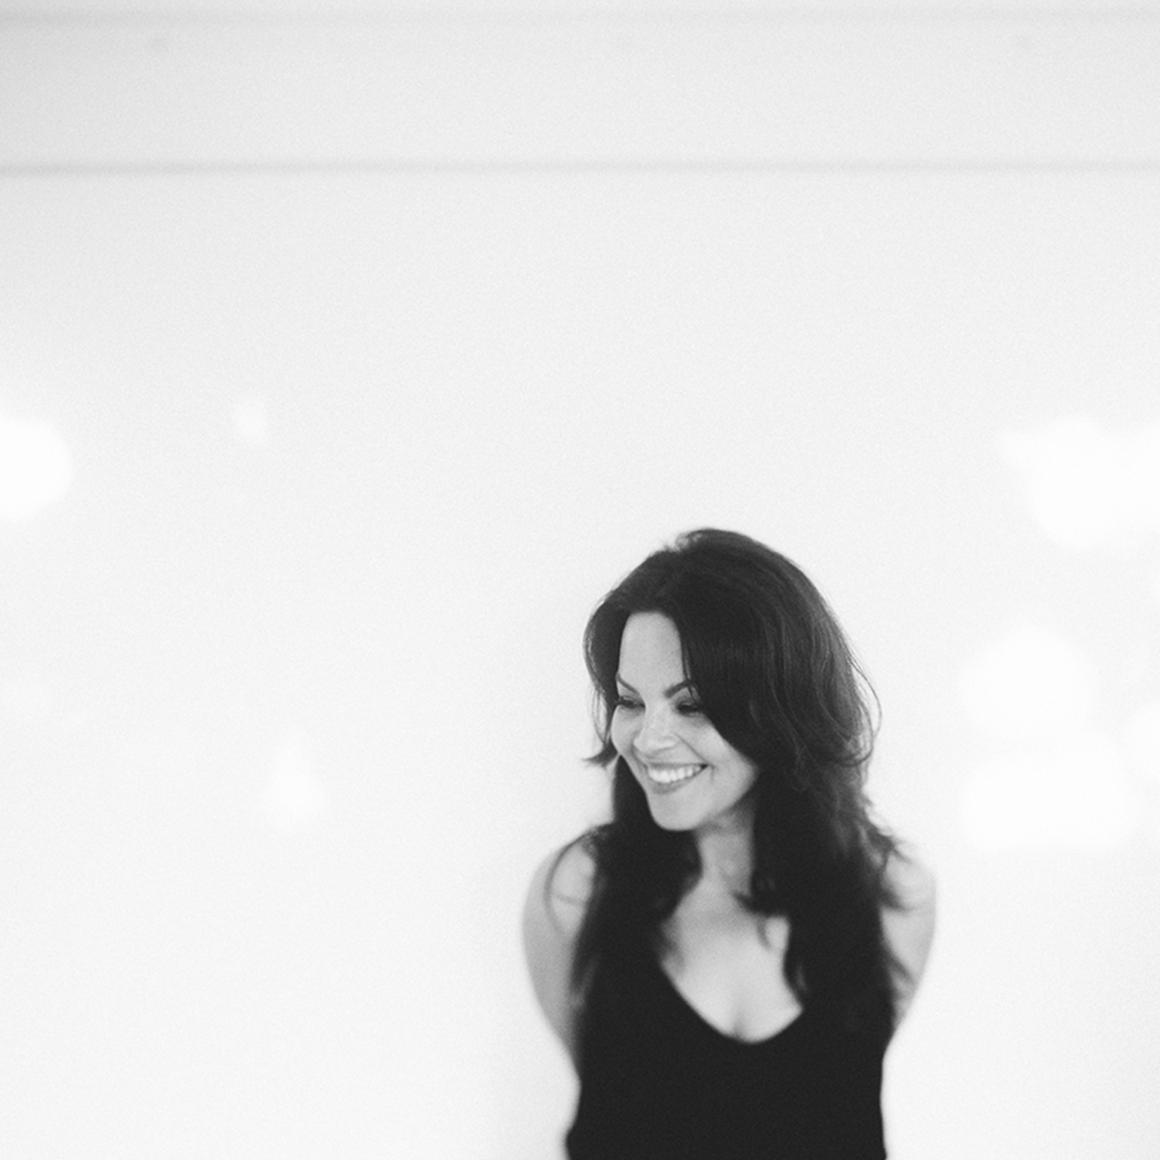 Danielle-Laporte-Let-the-Love-in